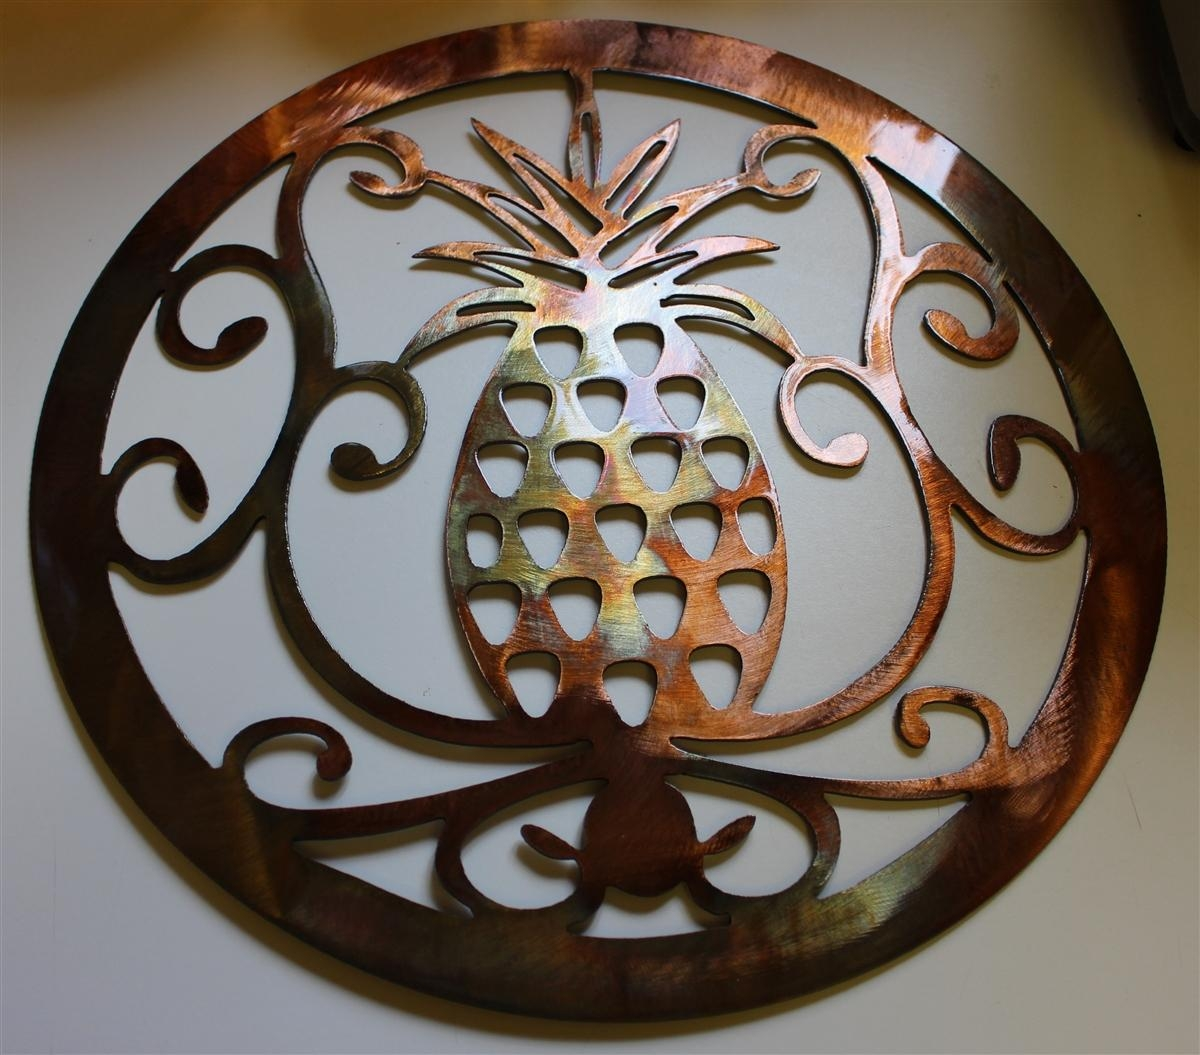 "Ornamental Pineapple 15"" Metal Wall Art Within Pineapple Metal Wall Art (View 2 of 20)"